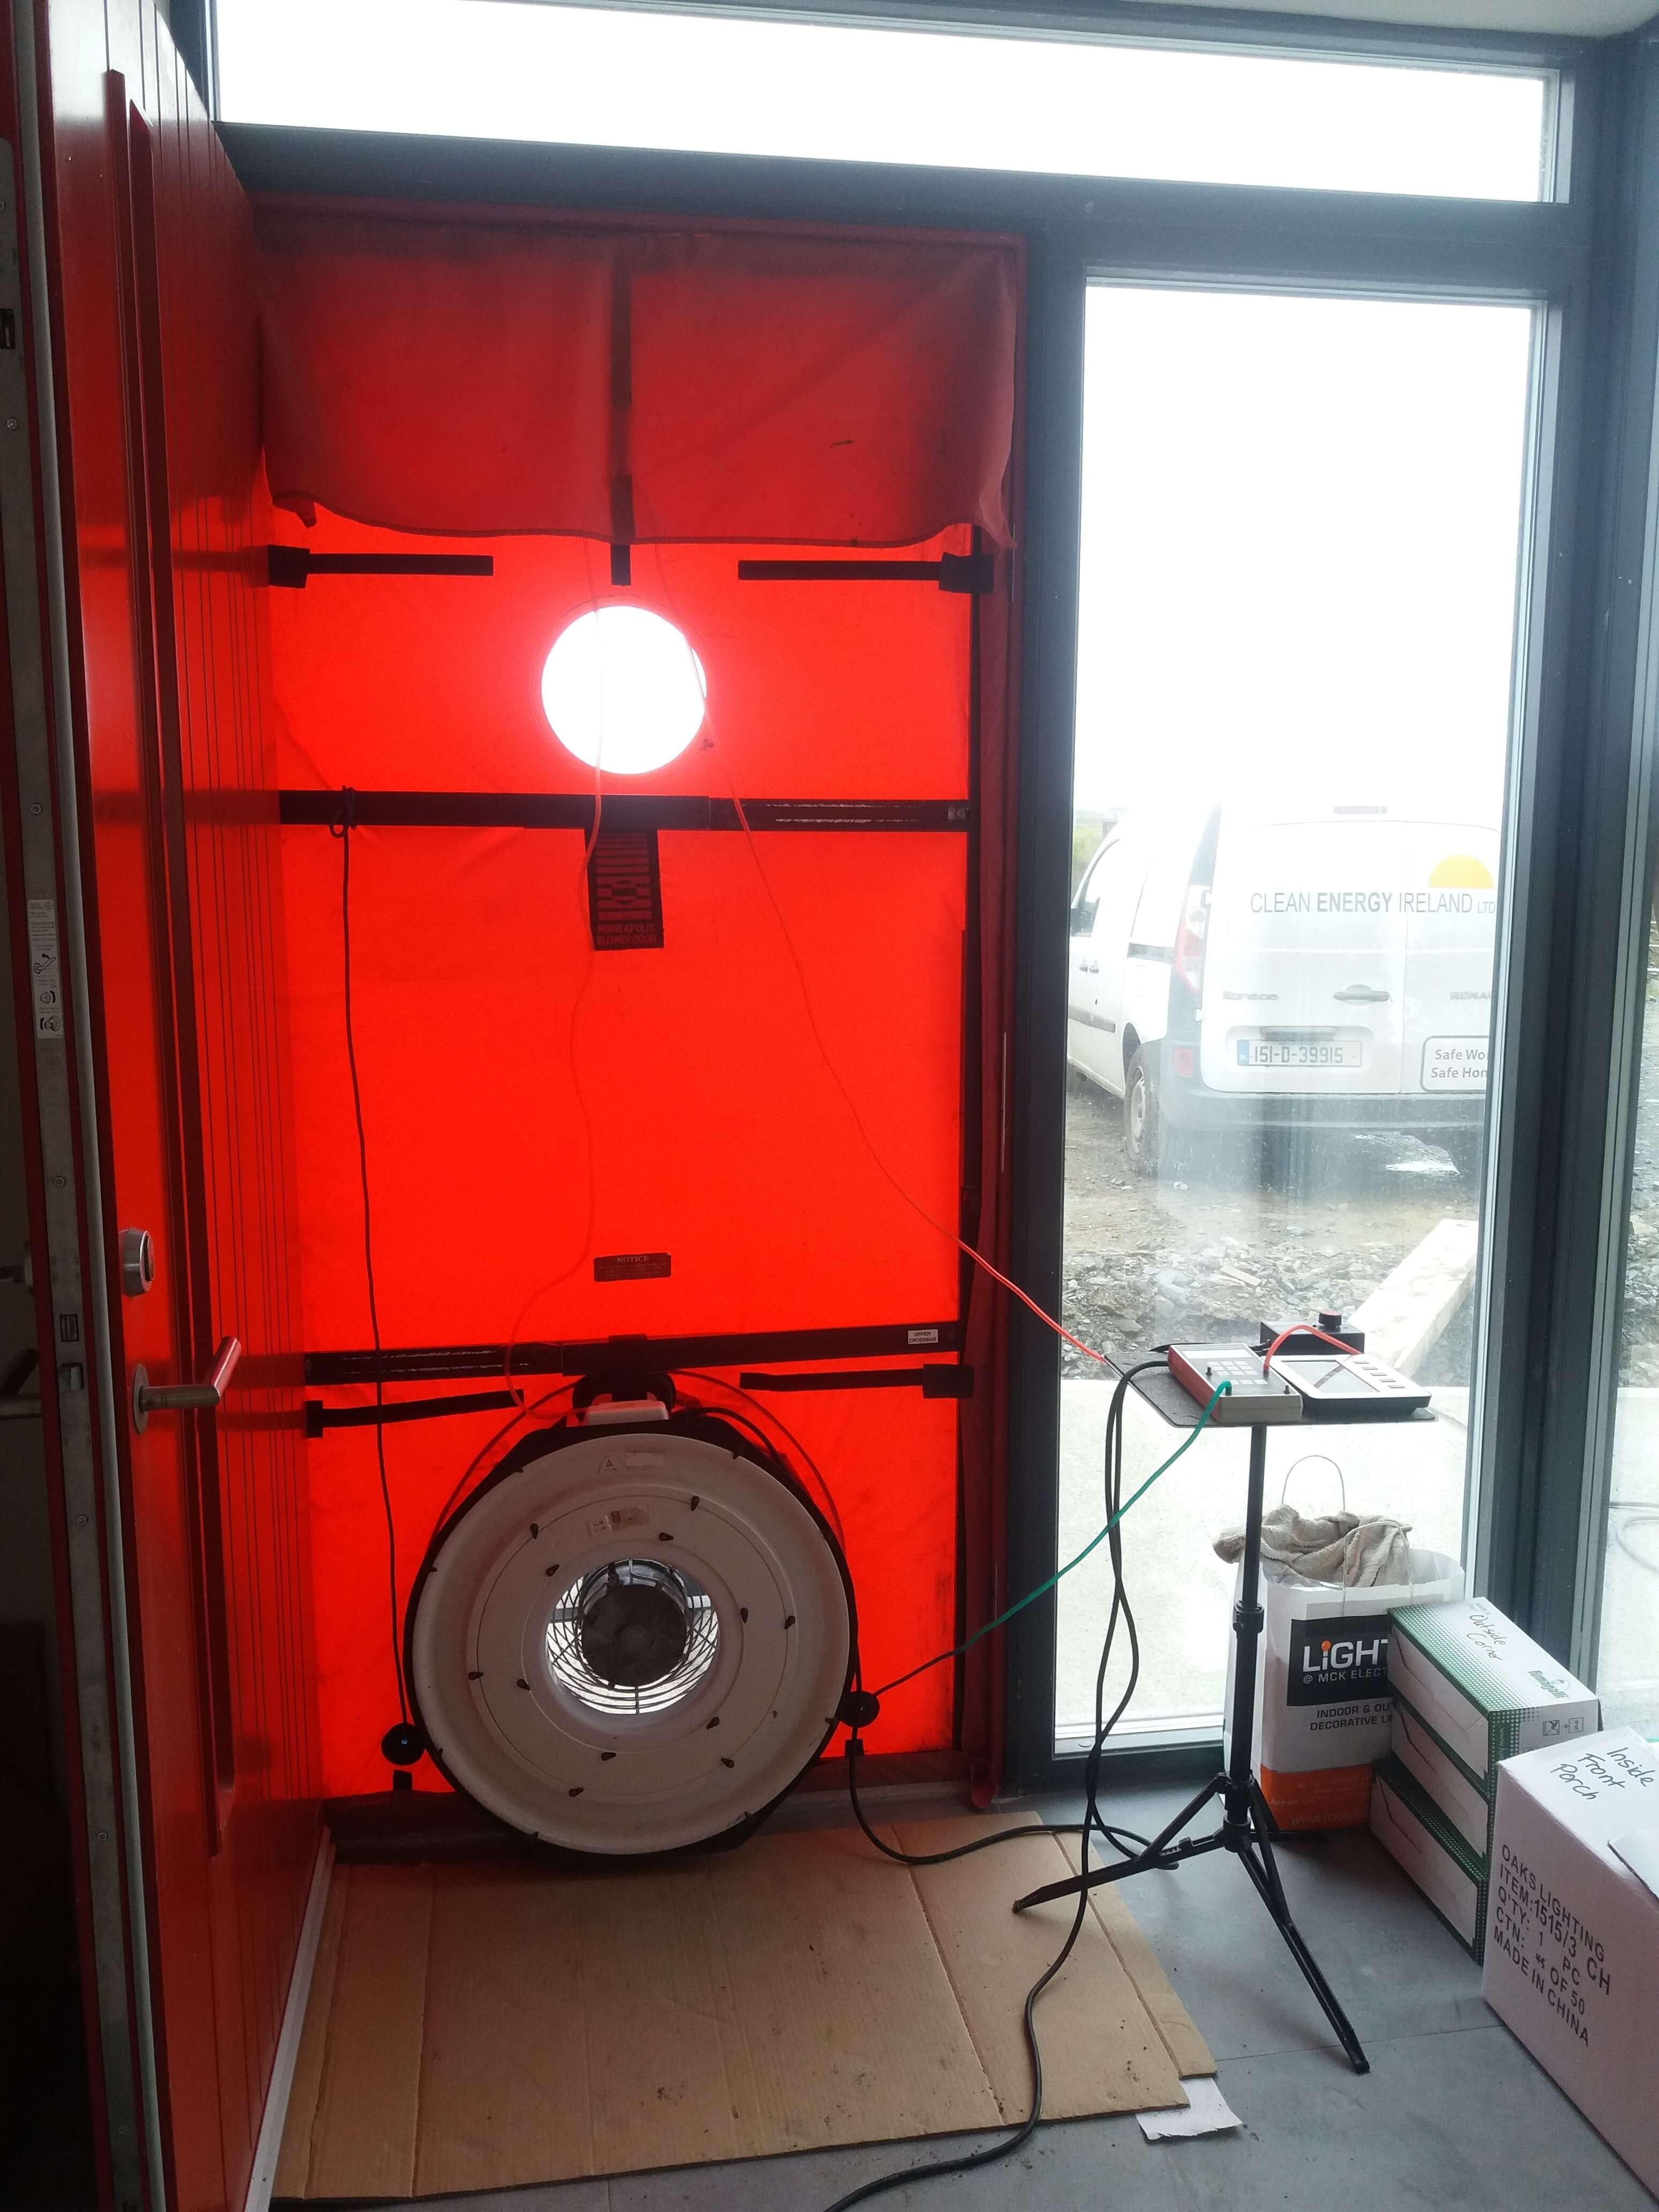 Airtightness testing